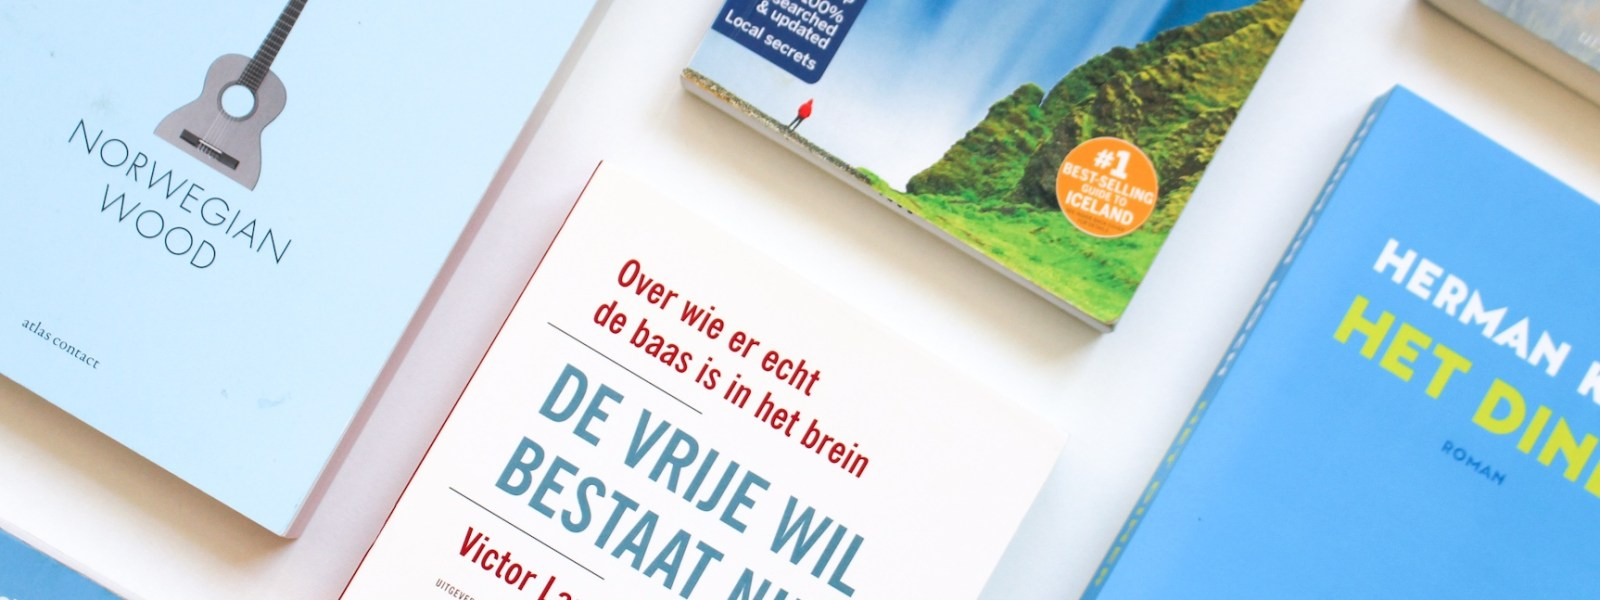 Book tips for the reading traveler